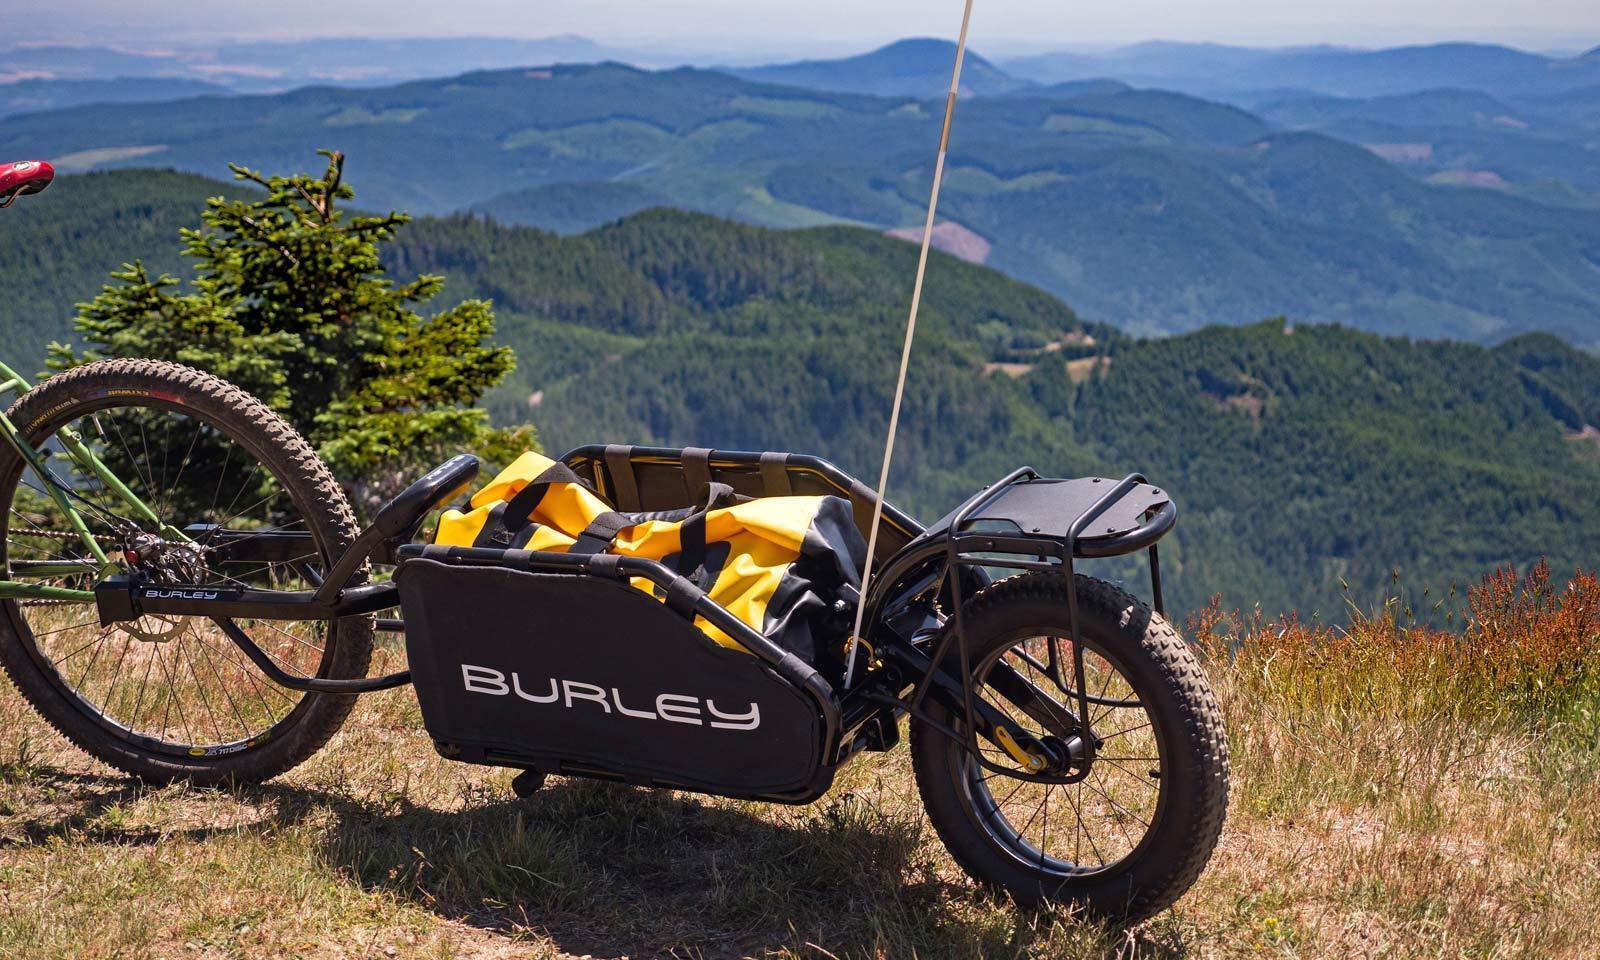 Burley-Coho-XC_full-suspension-single-wheel-off-road-mountain-bike-trailer.jpg